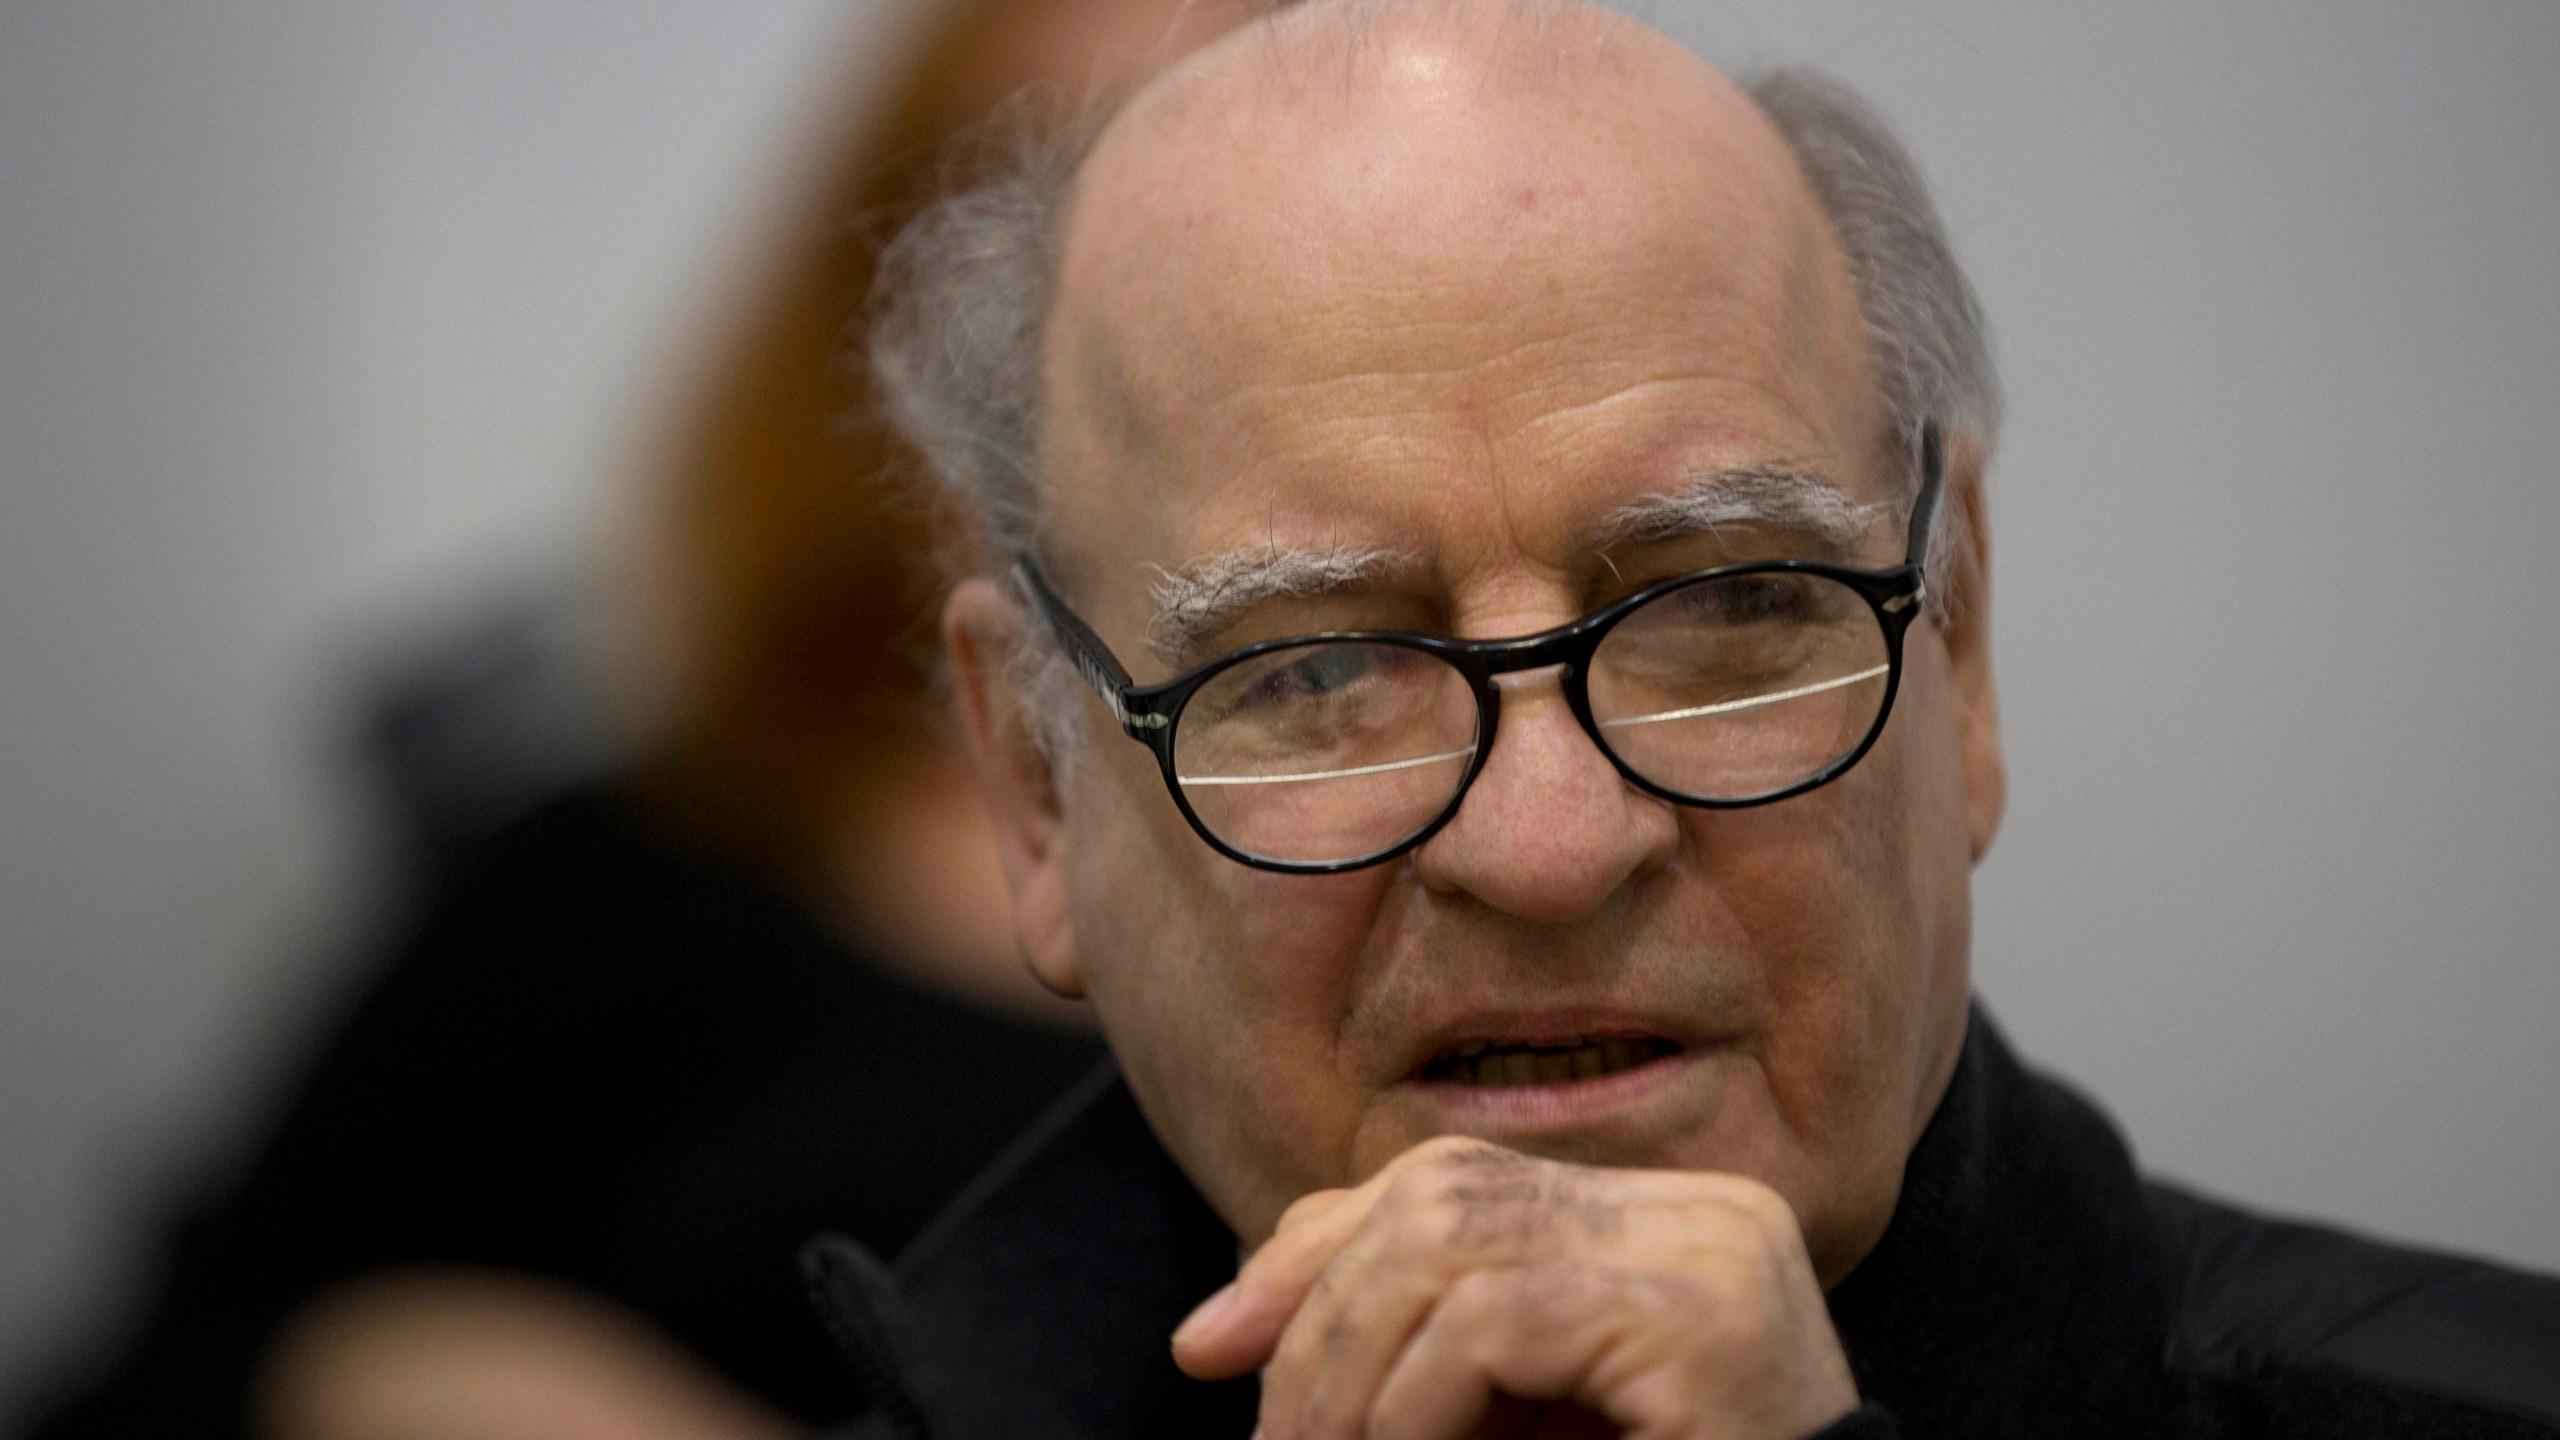 Joaquin Salvador Lavado